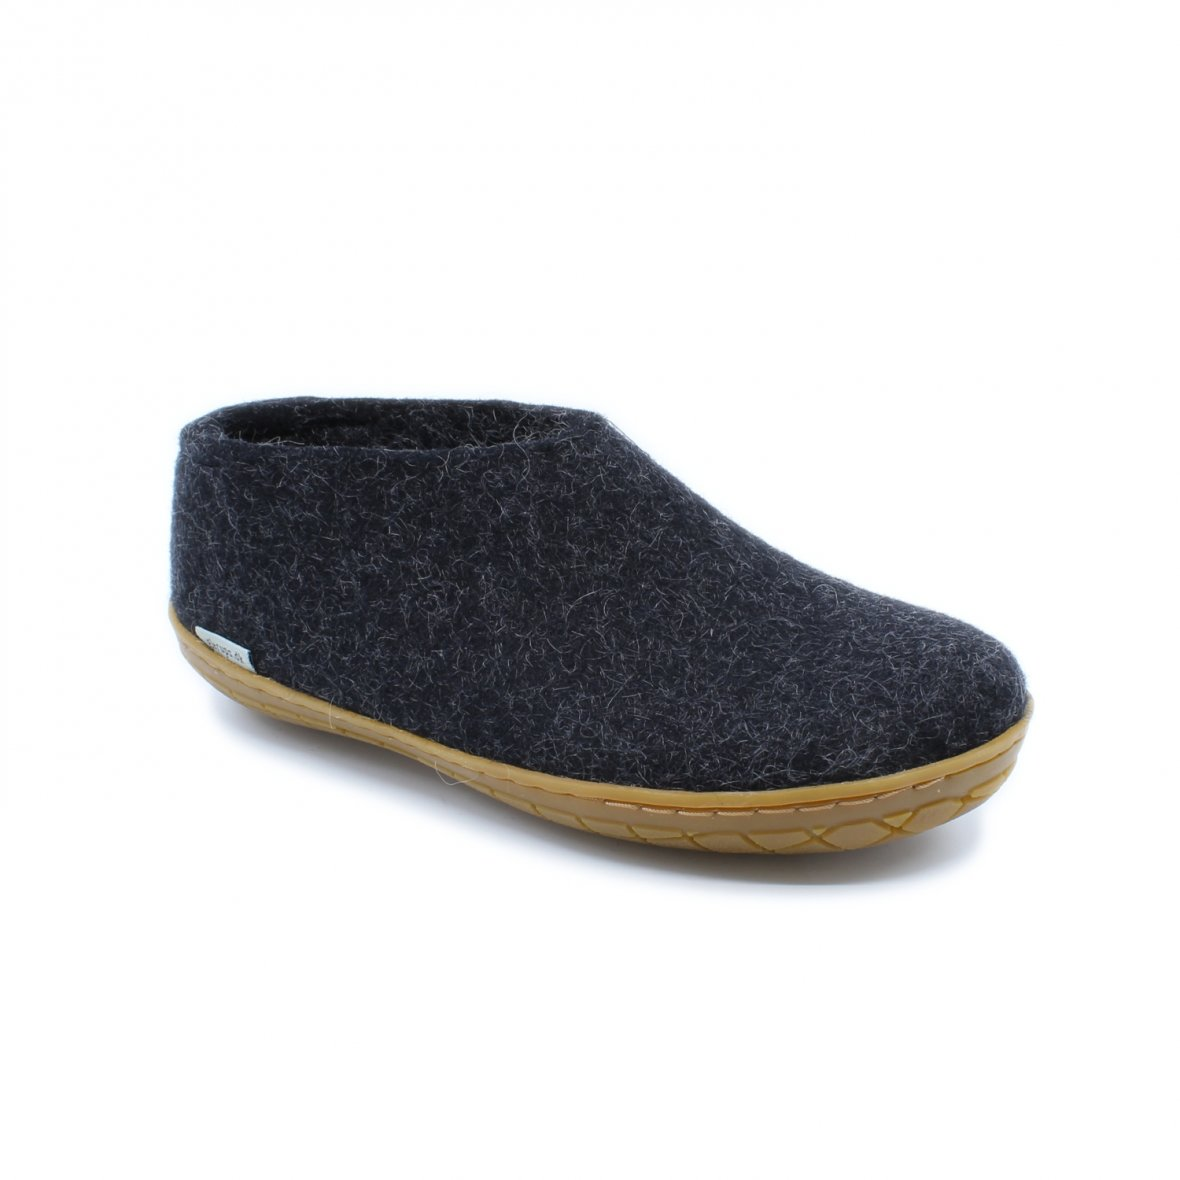 Glerups sko med naturgummisål, koksgrå, 40